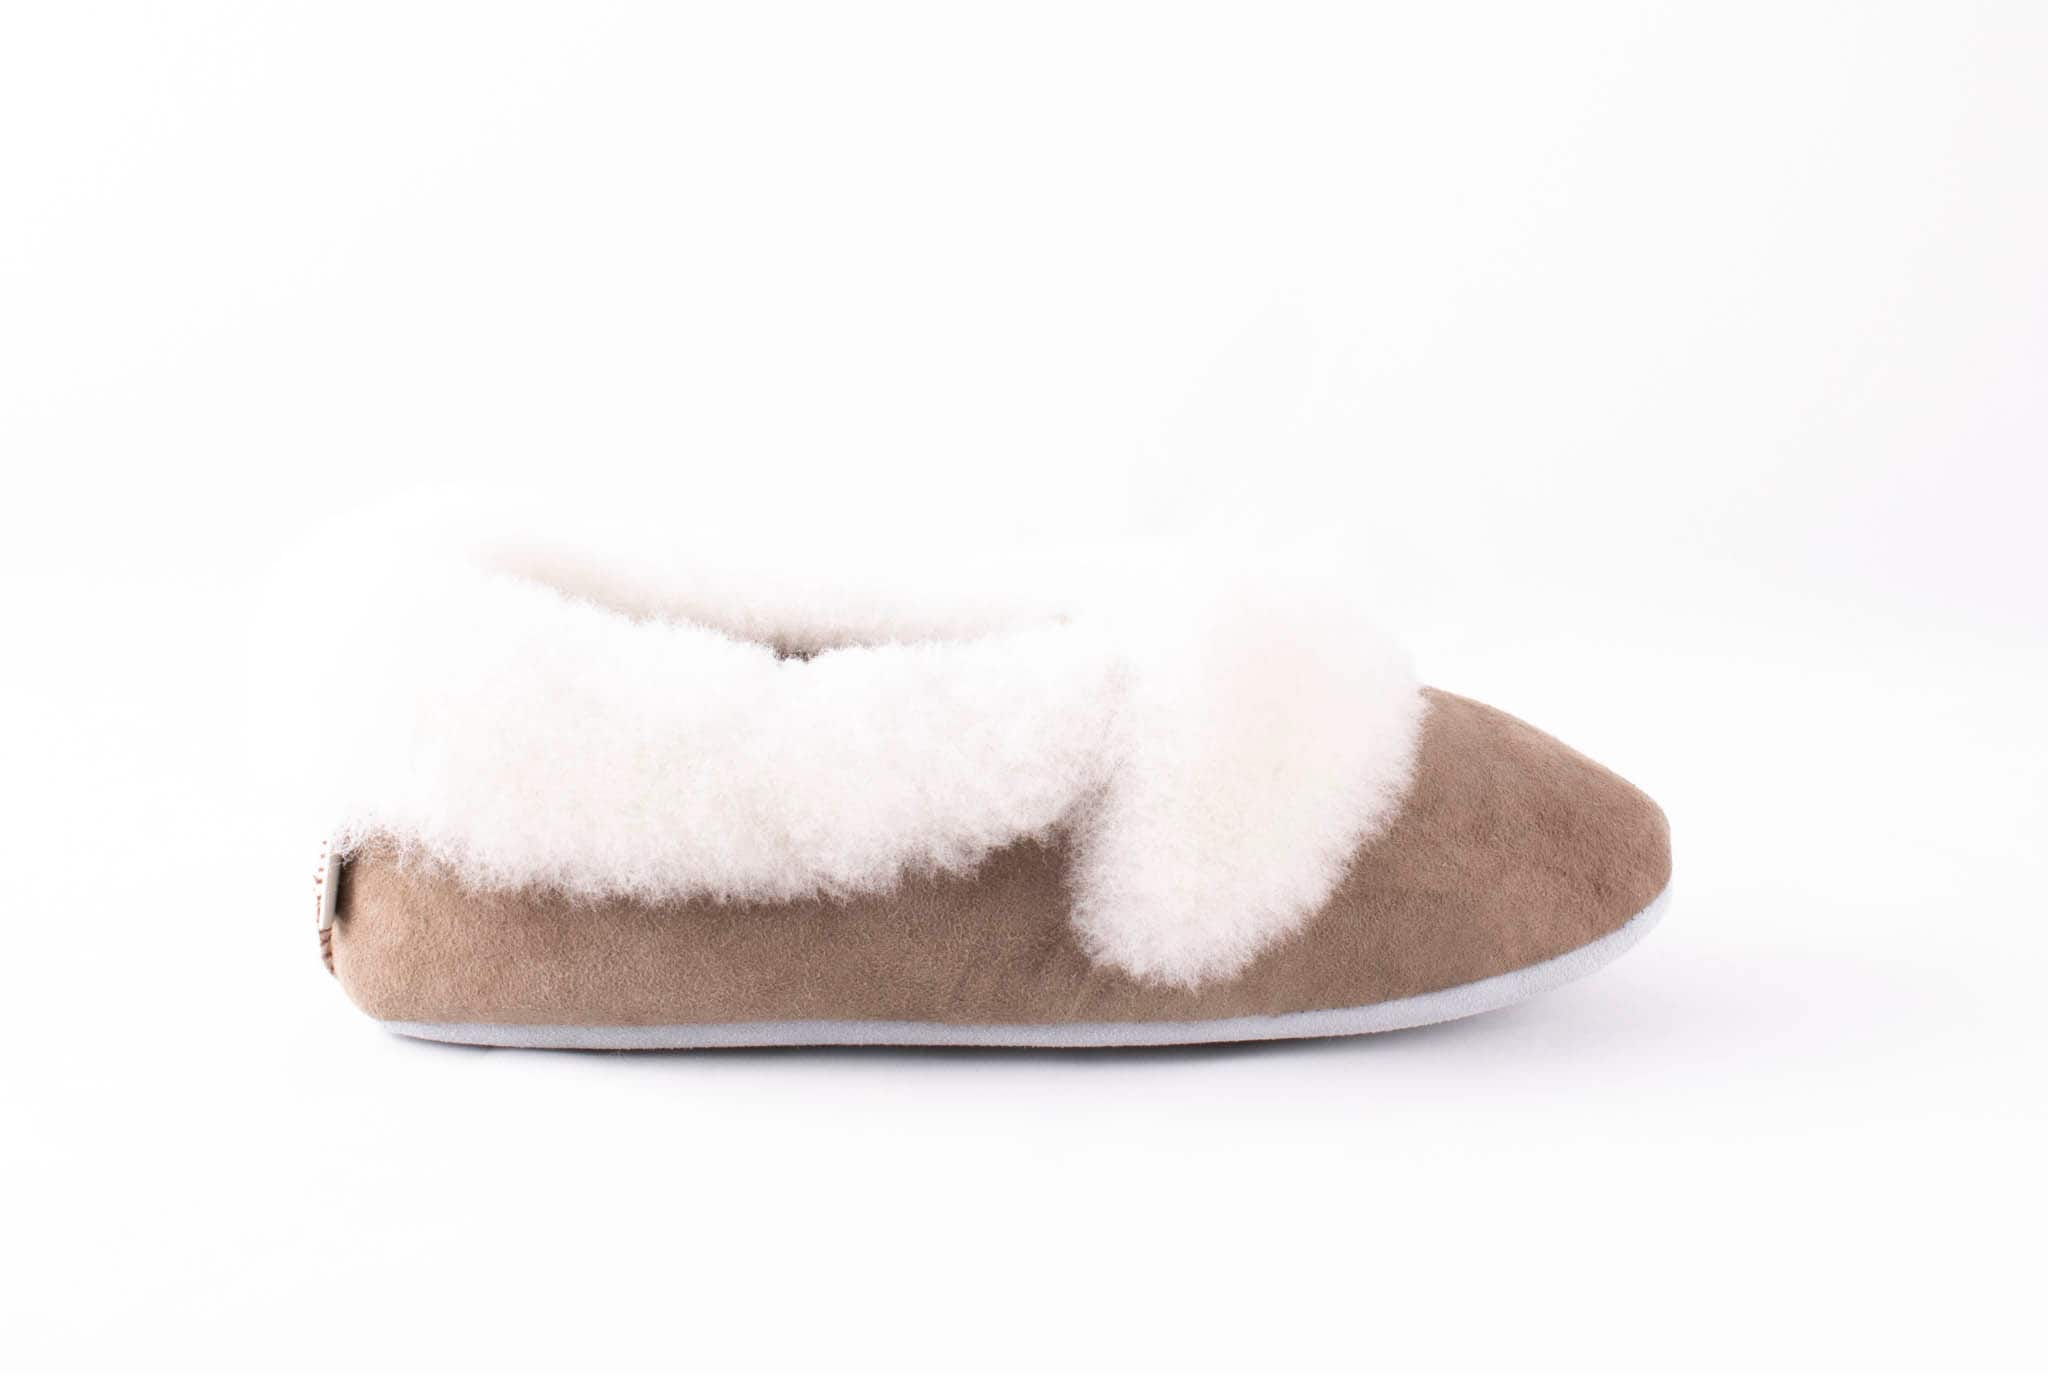 Rosa slippers